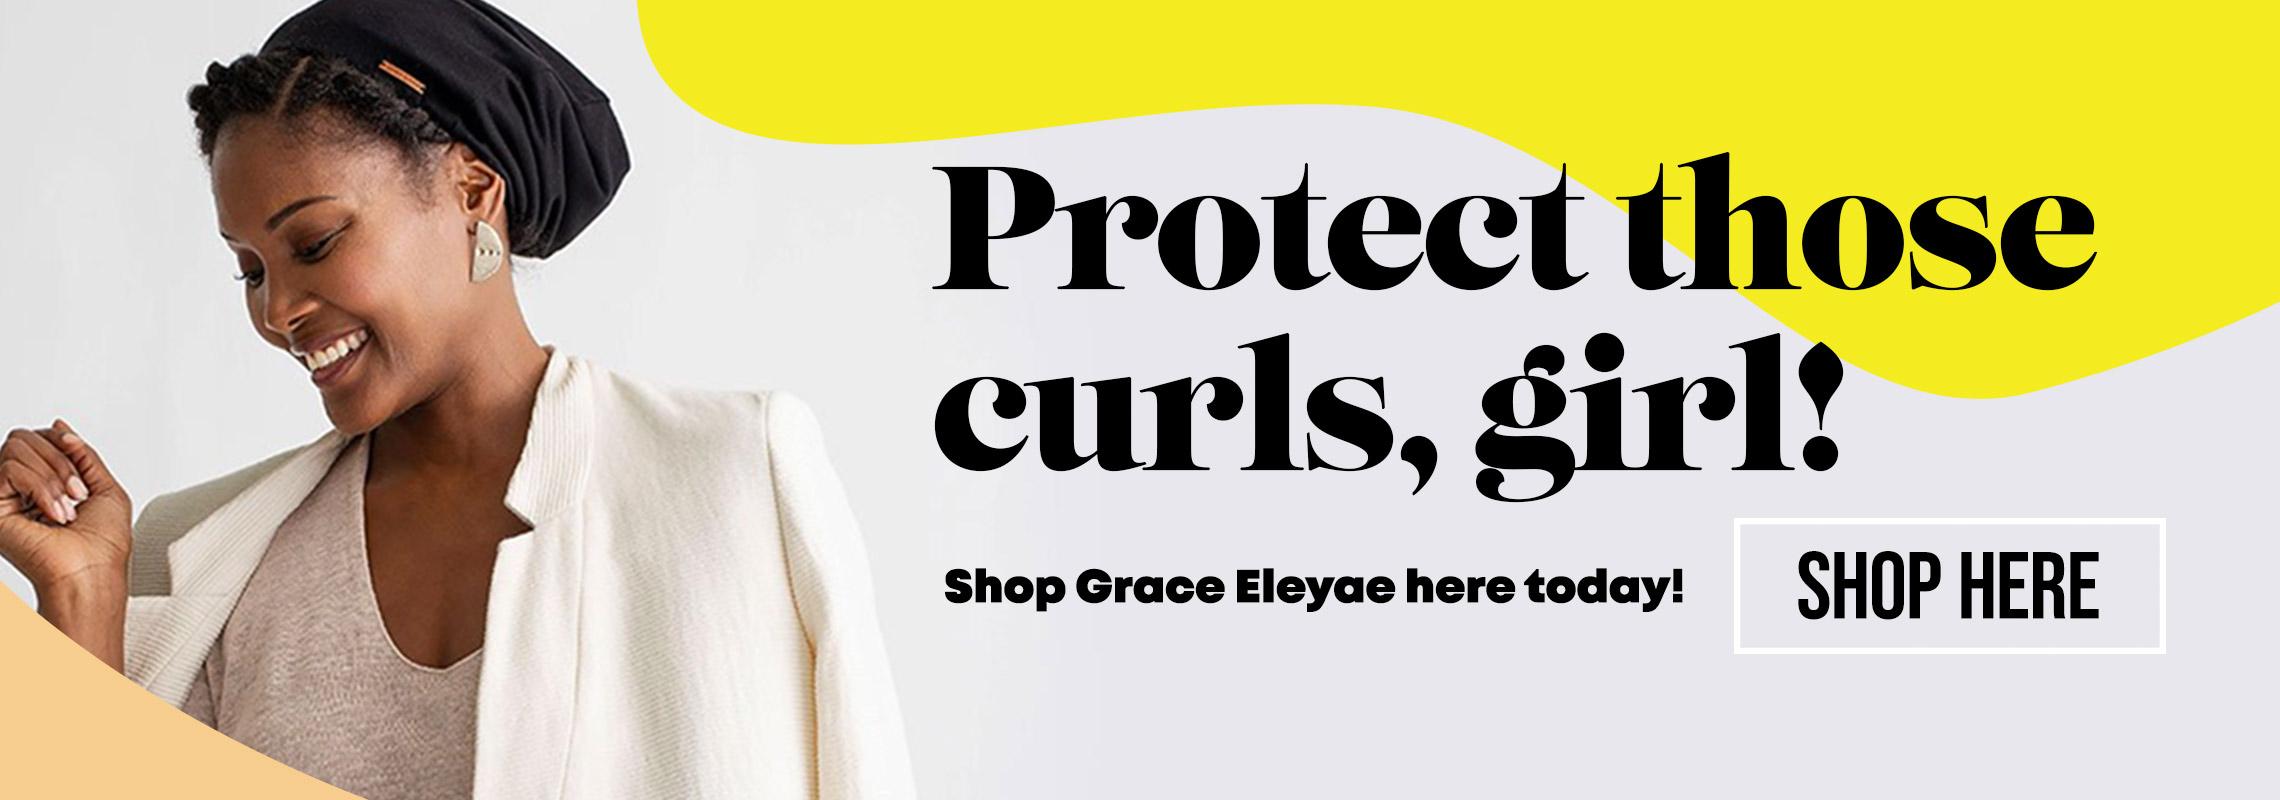 https://shop.naturallycurly.com/product_images/uploaded_images/grace-eleyae-mobile.jpg-2x.jpg